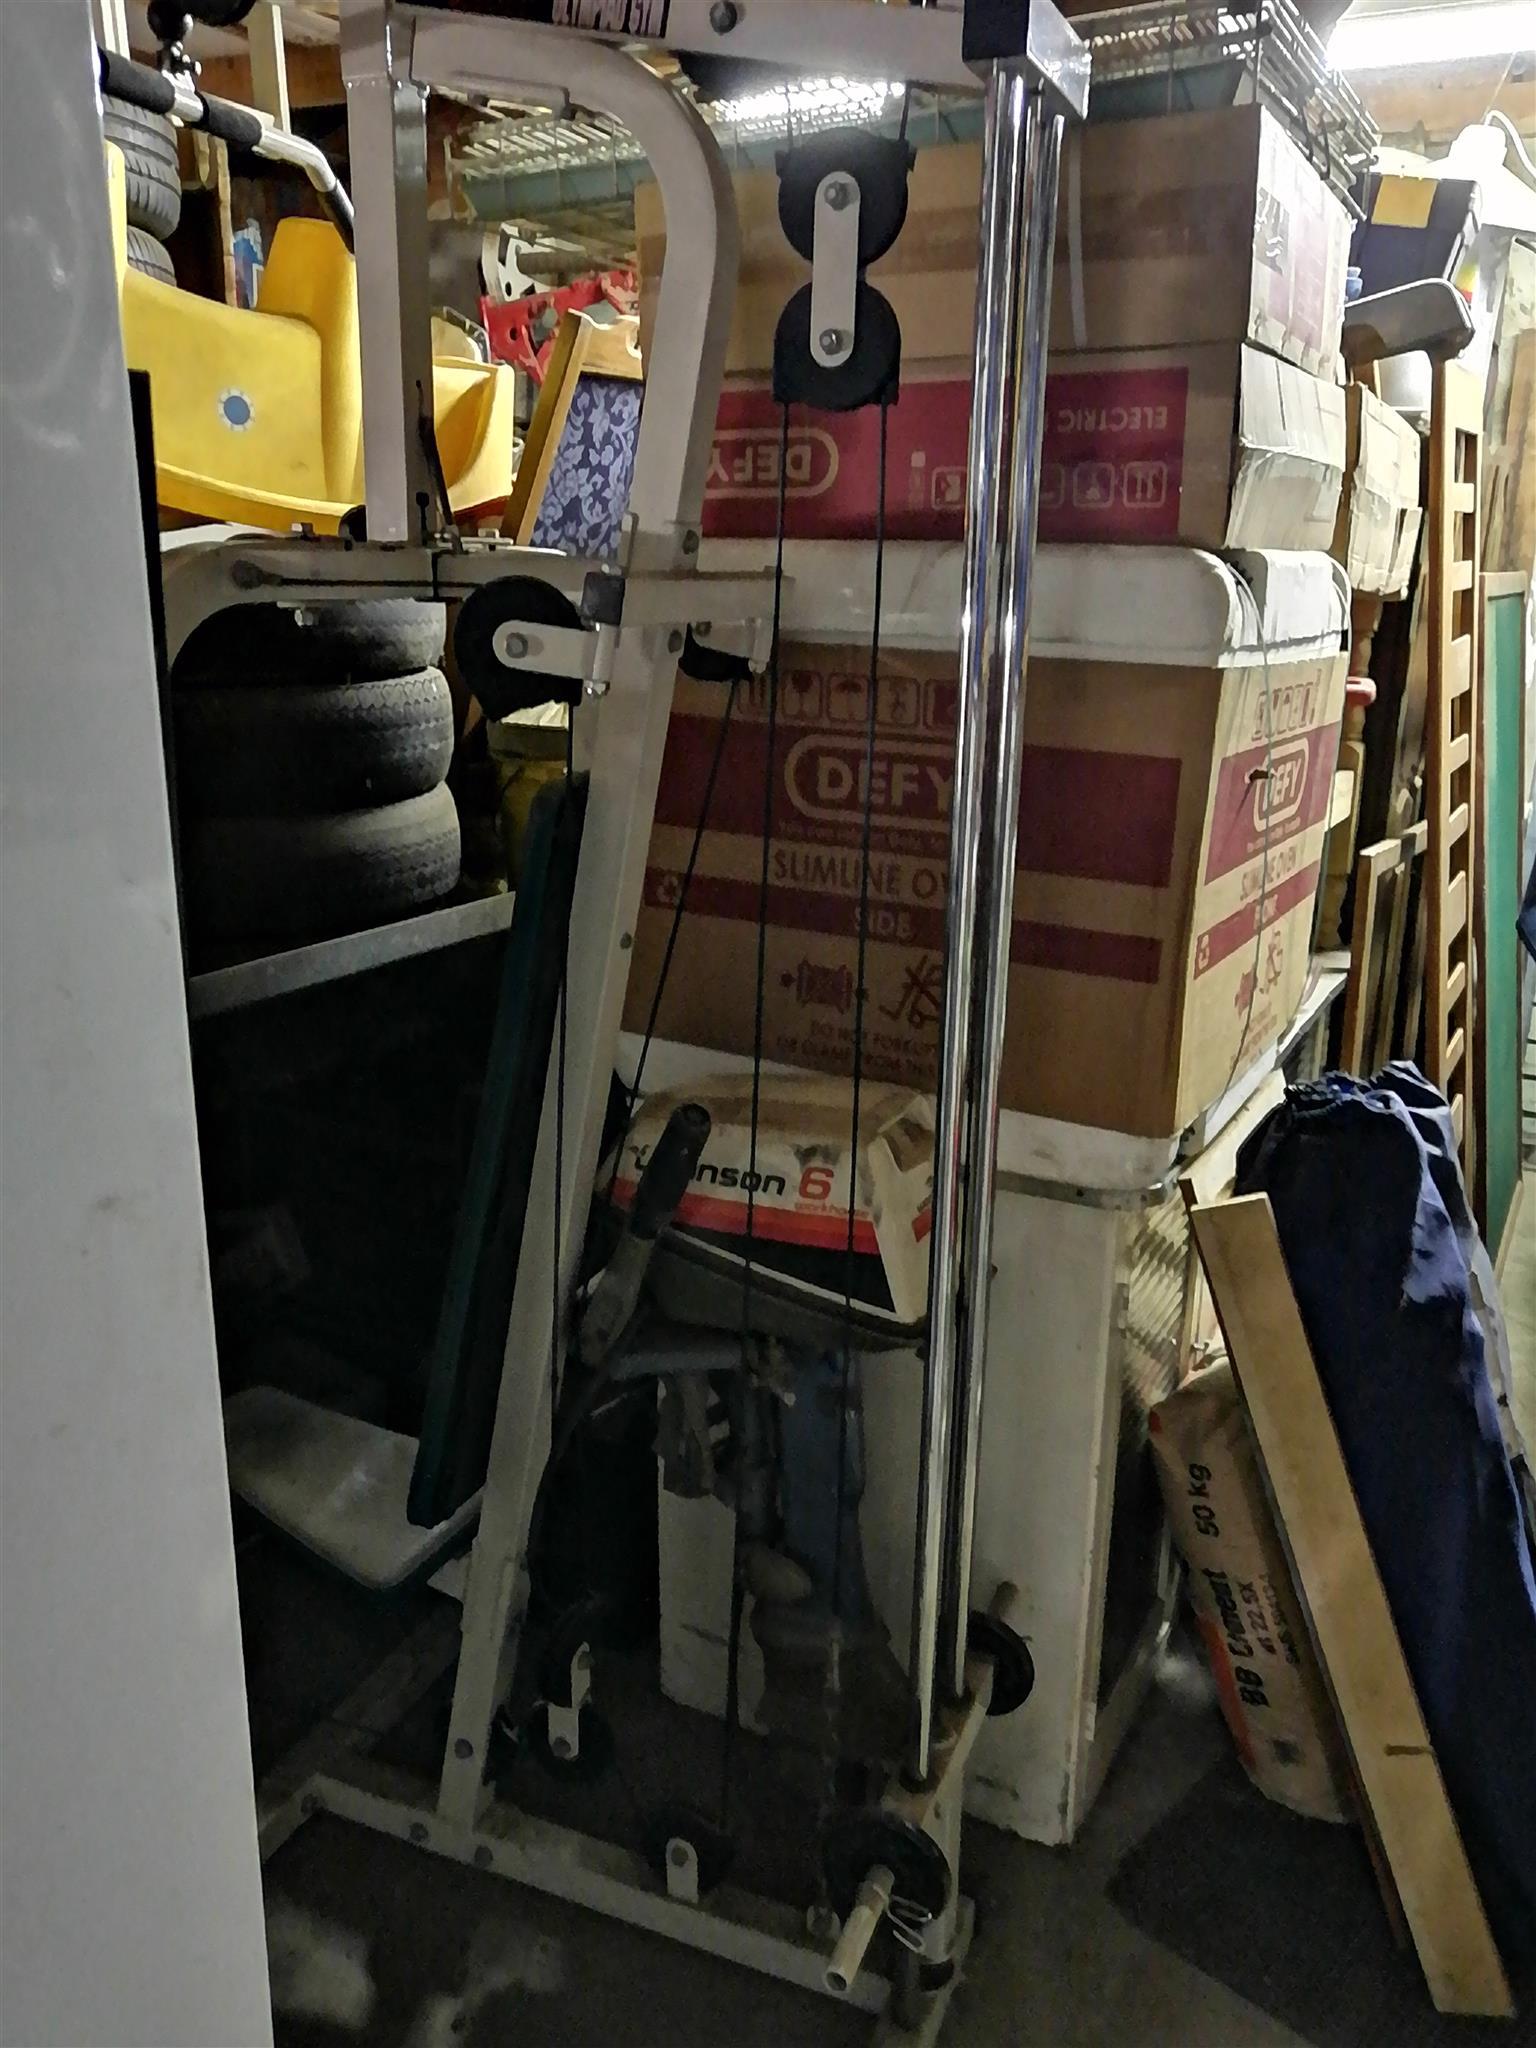 Trojan gym equipment + bench press